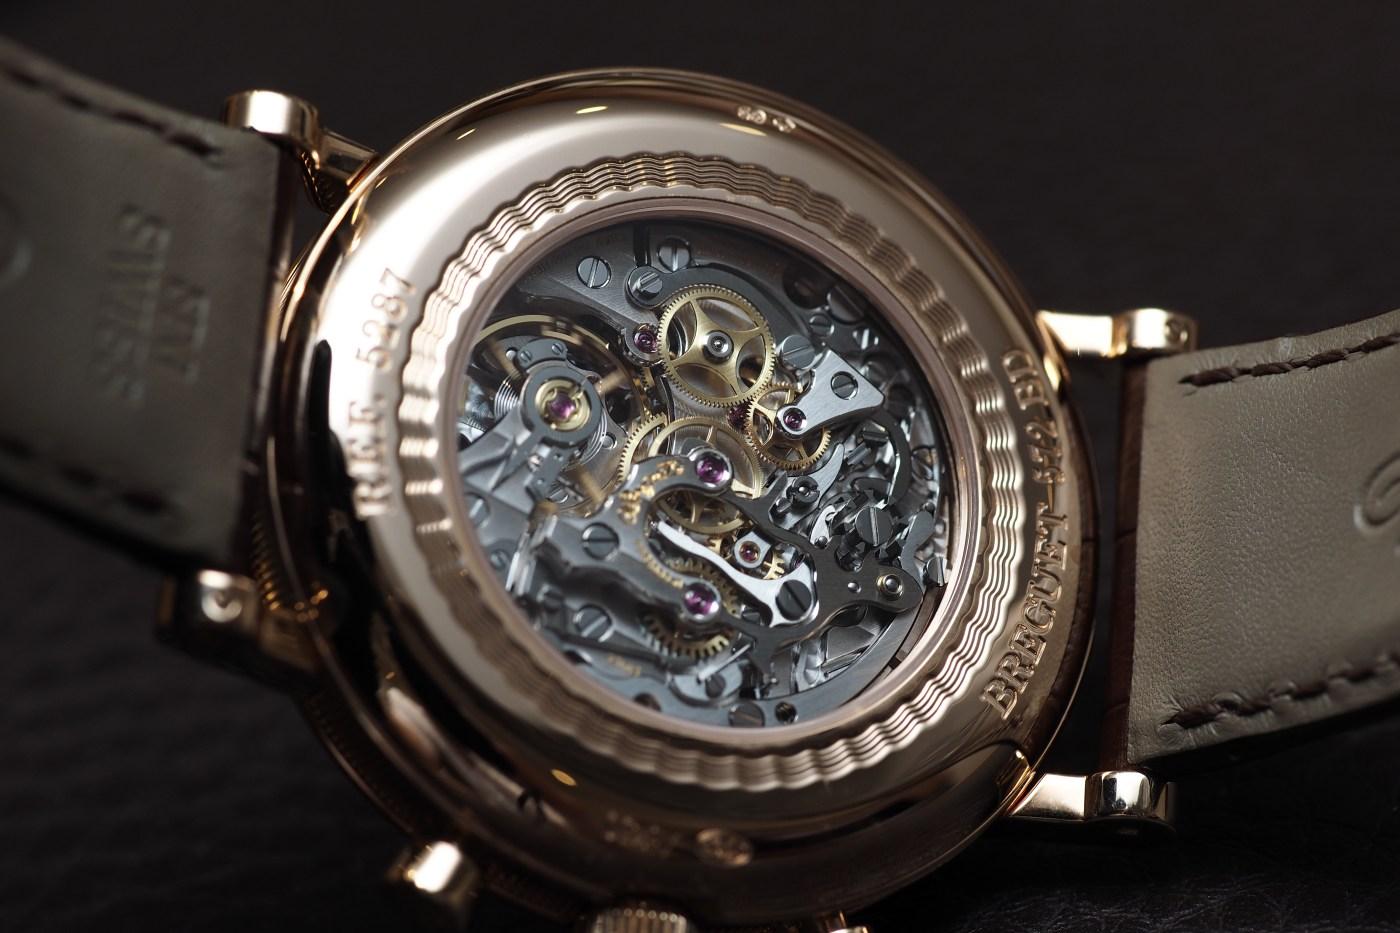 Breguet Classique Chronograph Ref. 5287